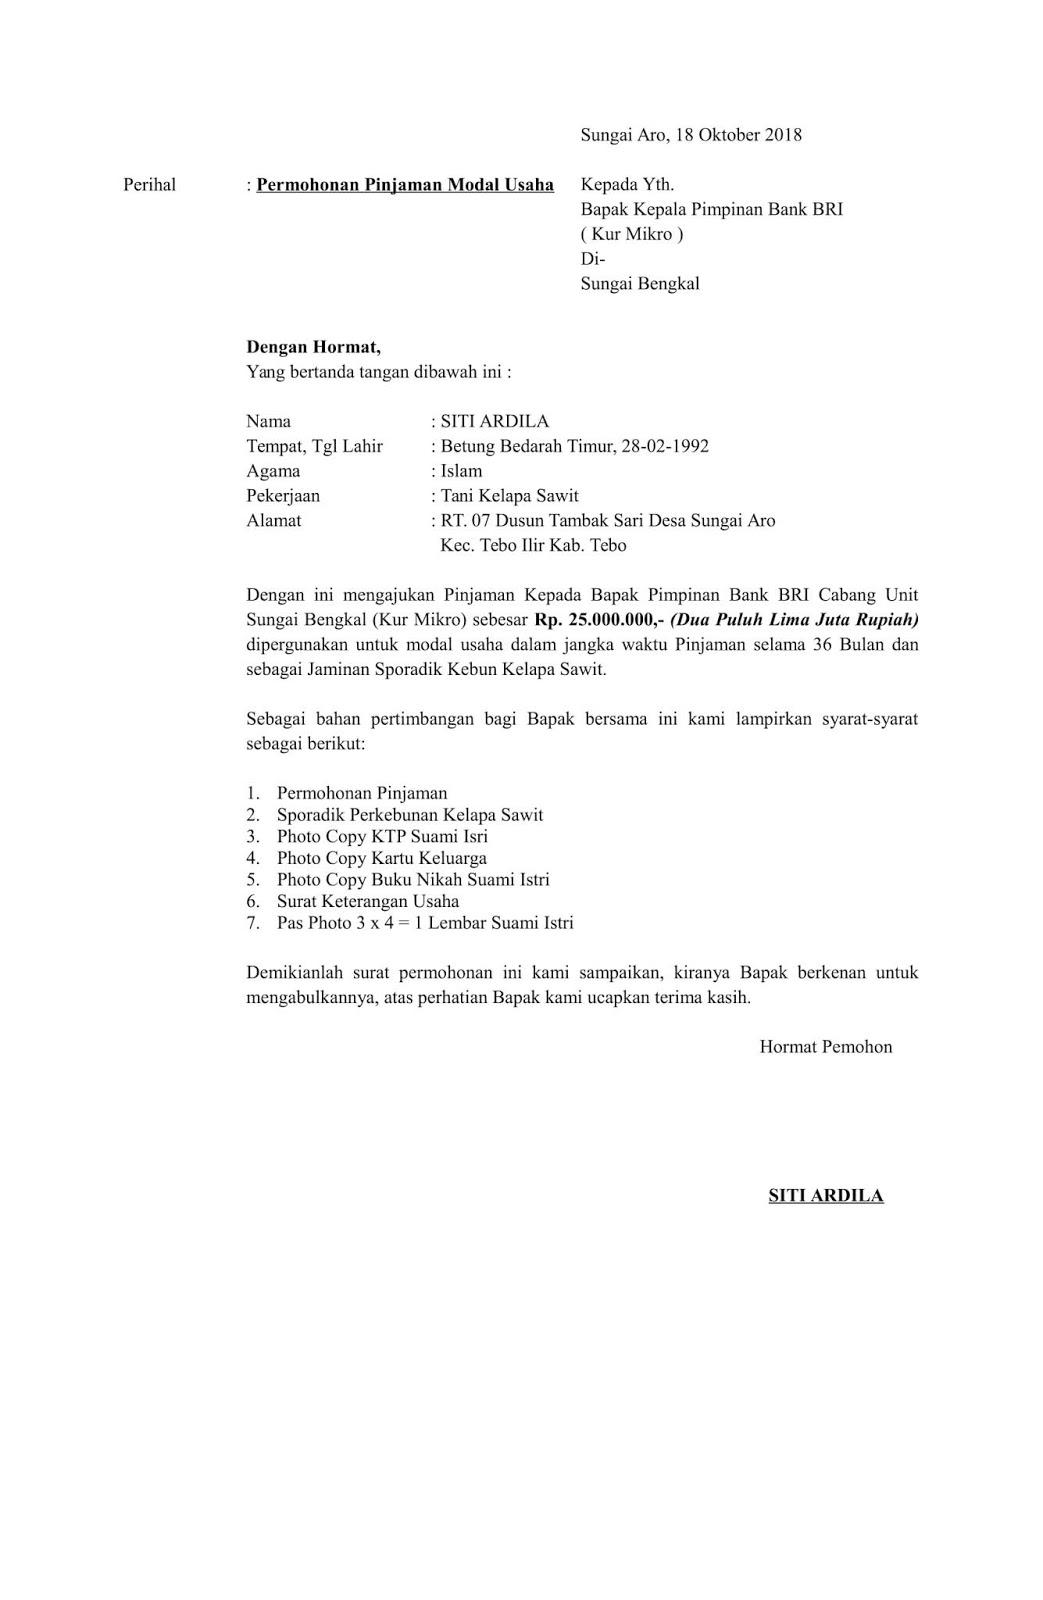 Contoh Surat Permohonan Pinjaman Modal Usaha atau Dana KUR ...